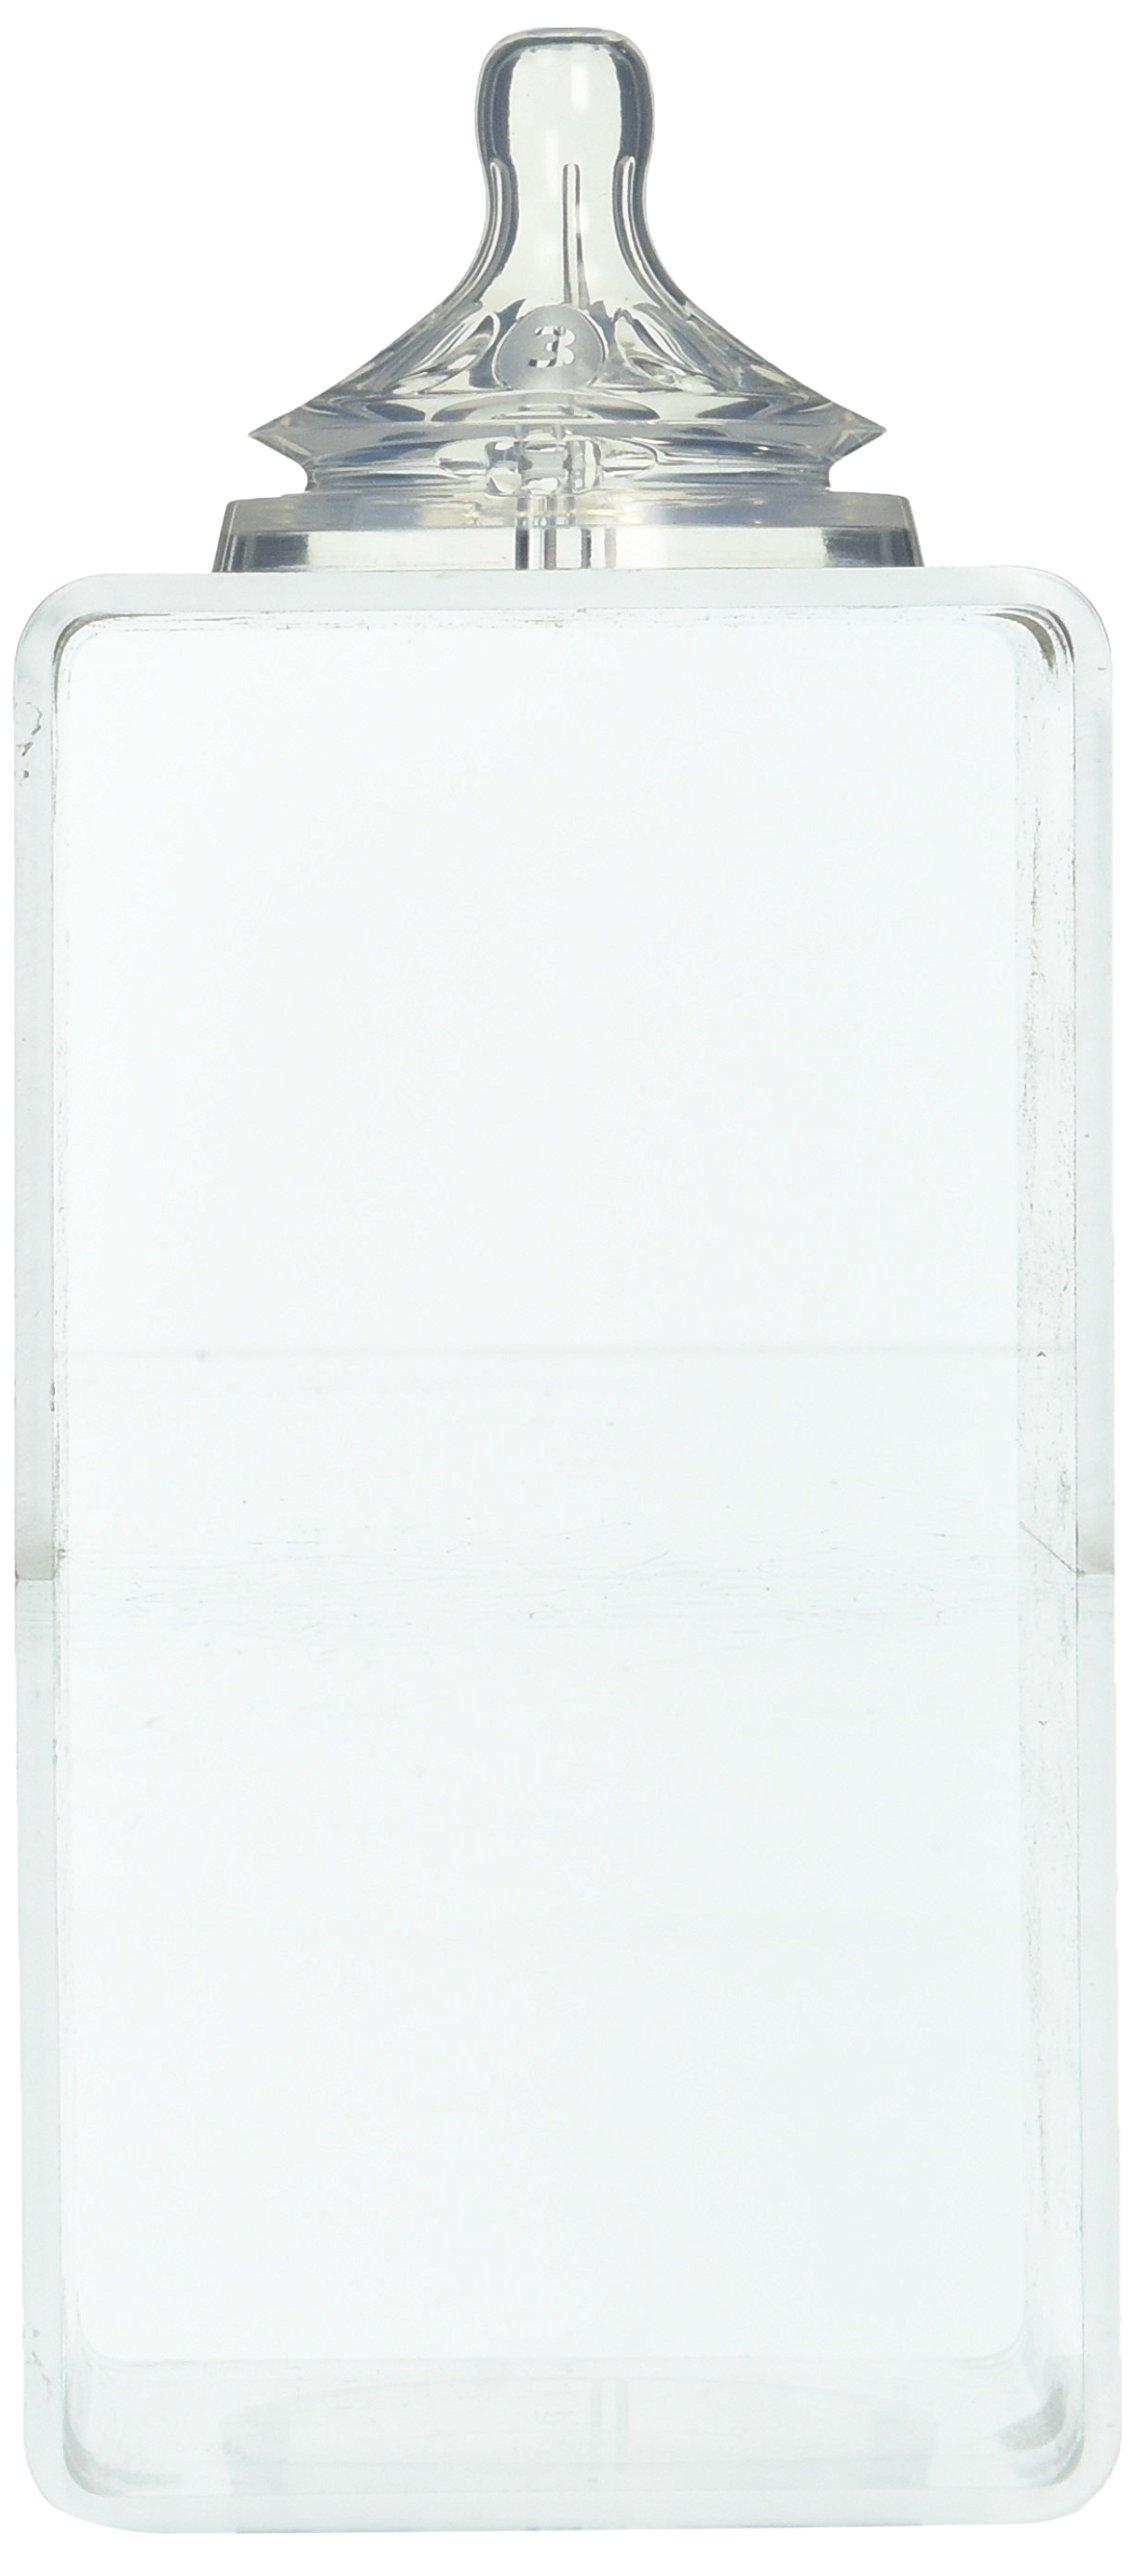 Philips Avent Natural Nipple Medium Flow - 6 Pack